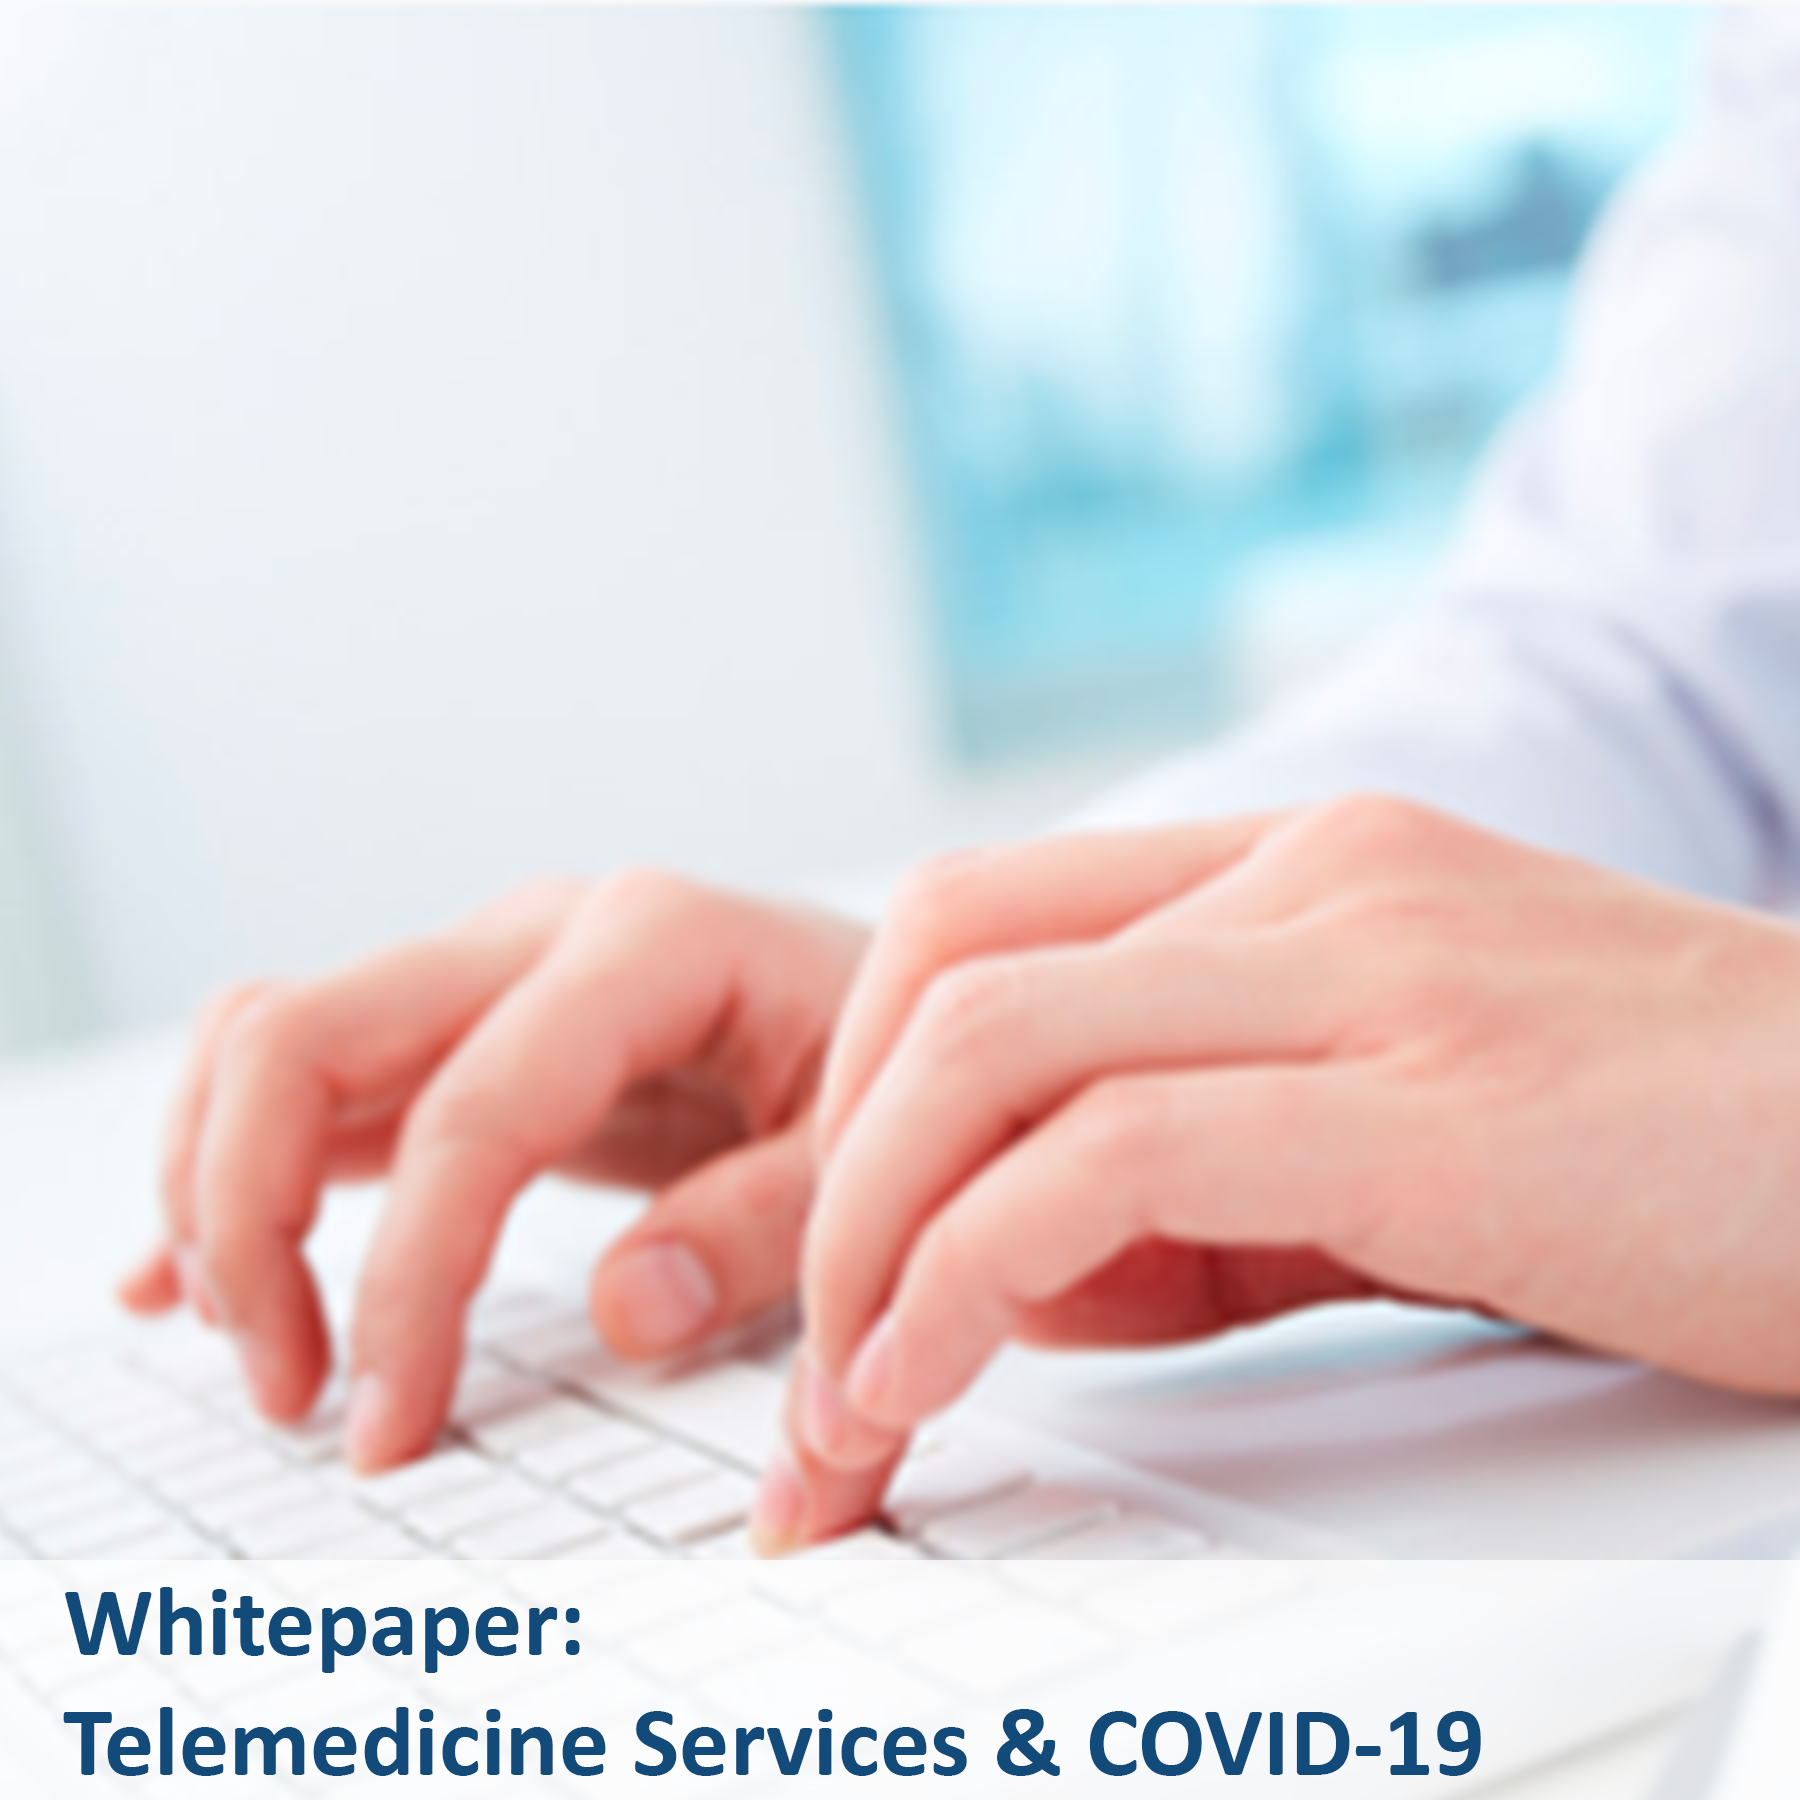 Whitepaper - Telemedicine Services